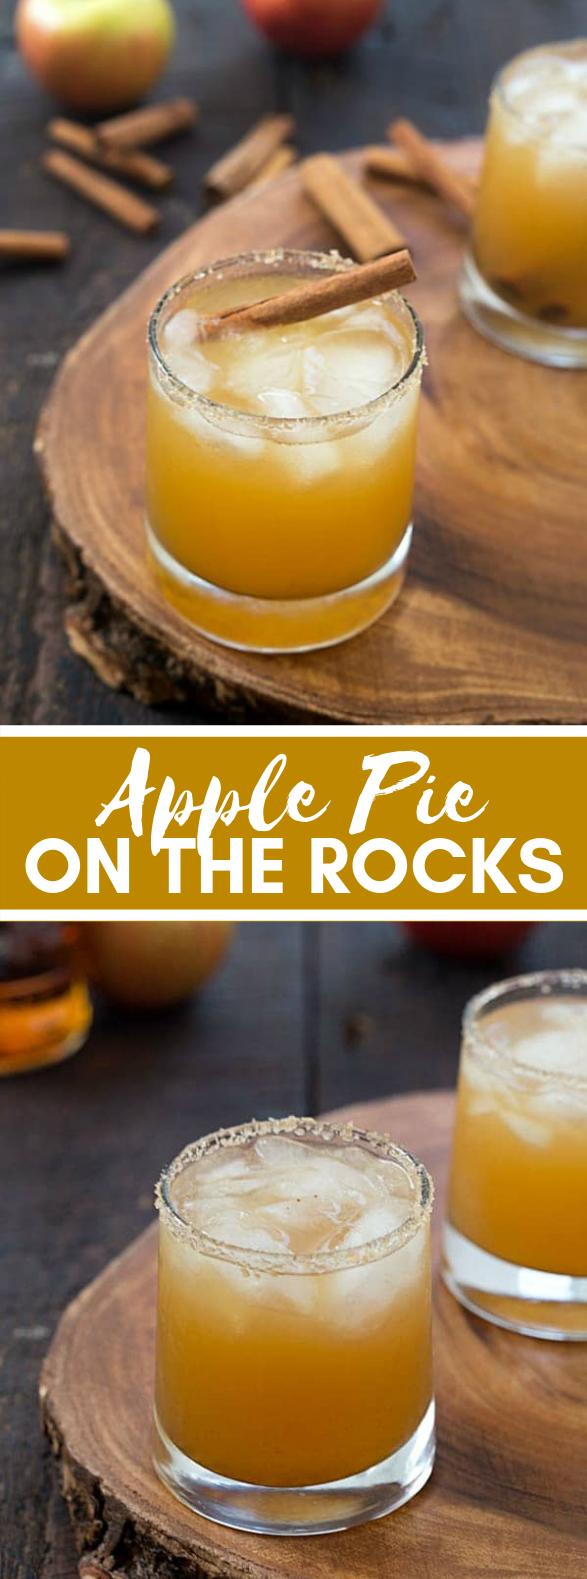 Apple pie on the Rocks #thanksgiving #christmas